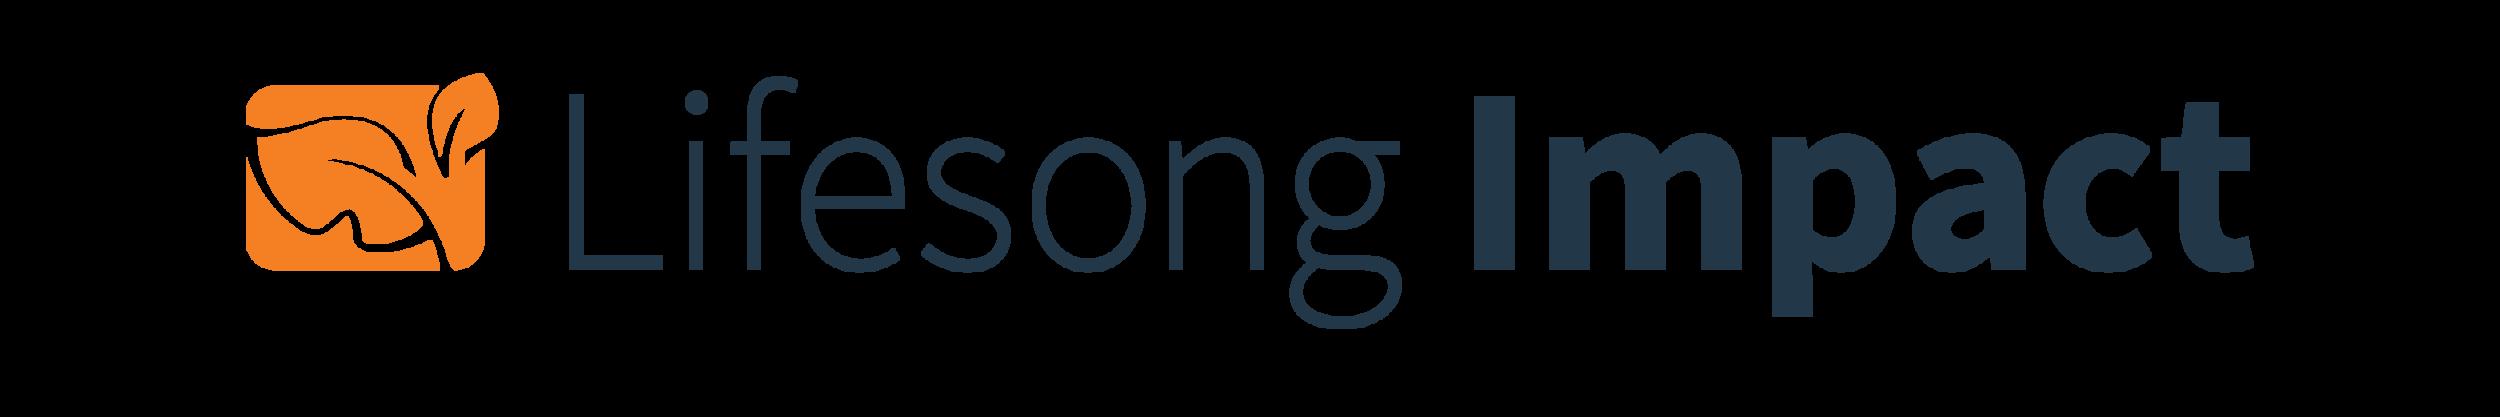 lifesong-impact-logo-.png